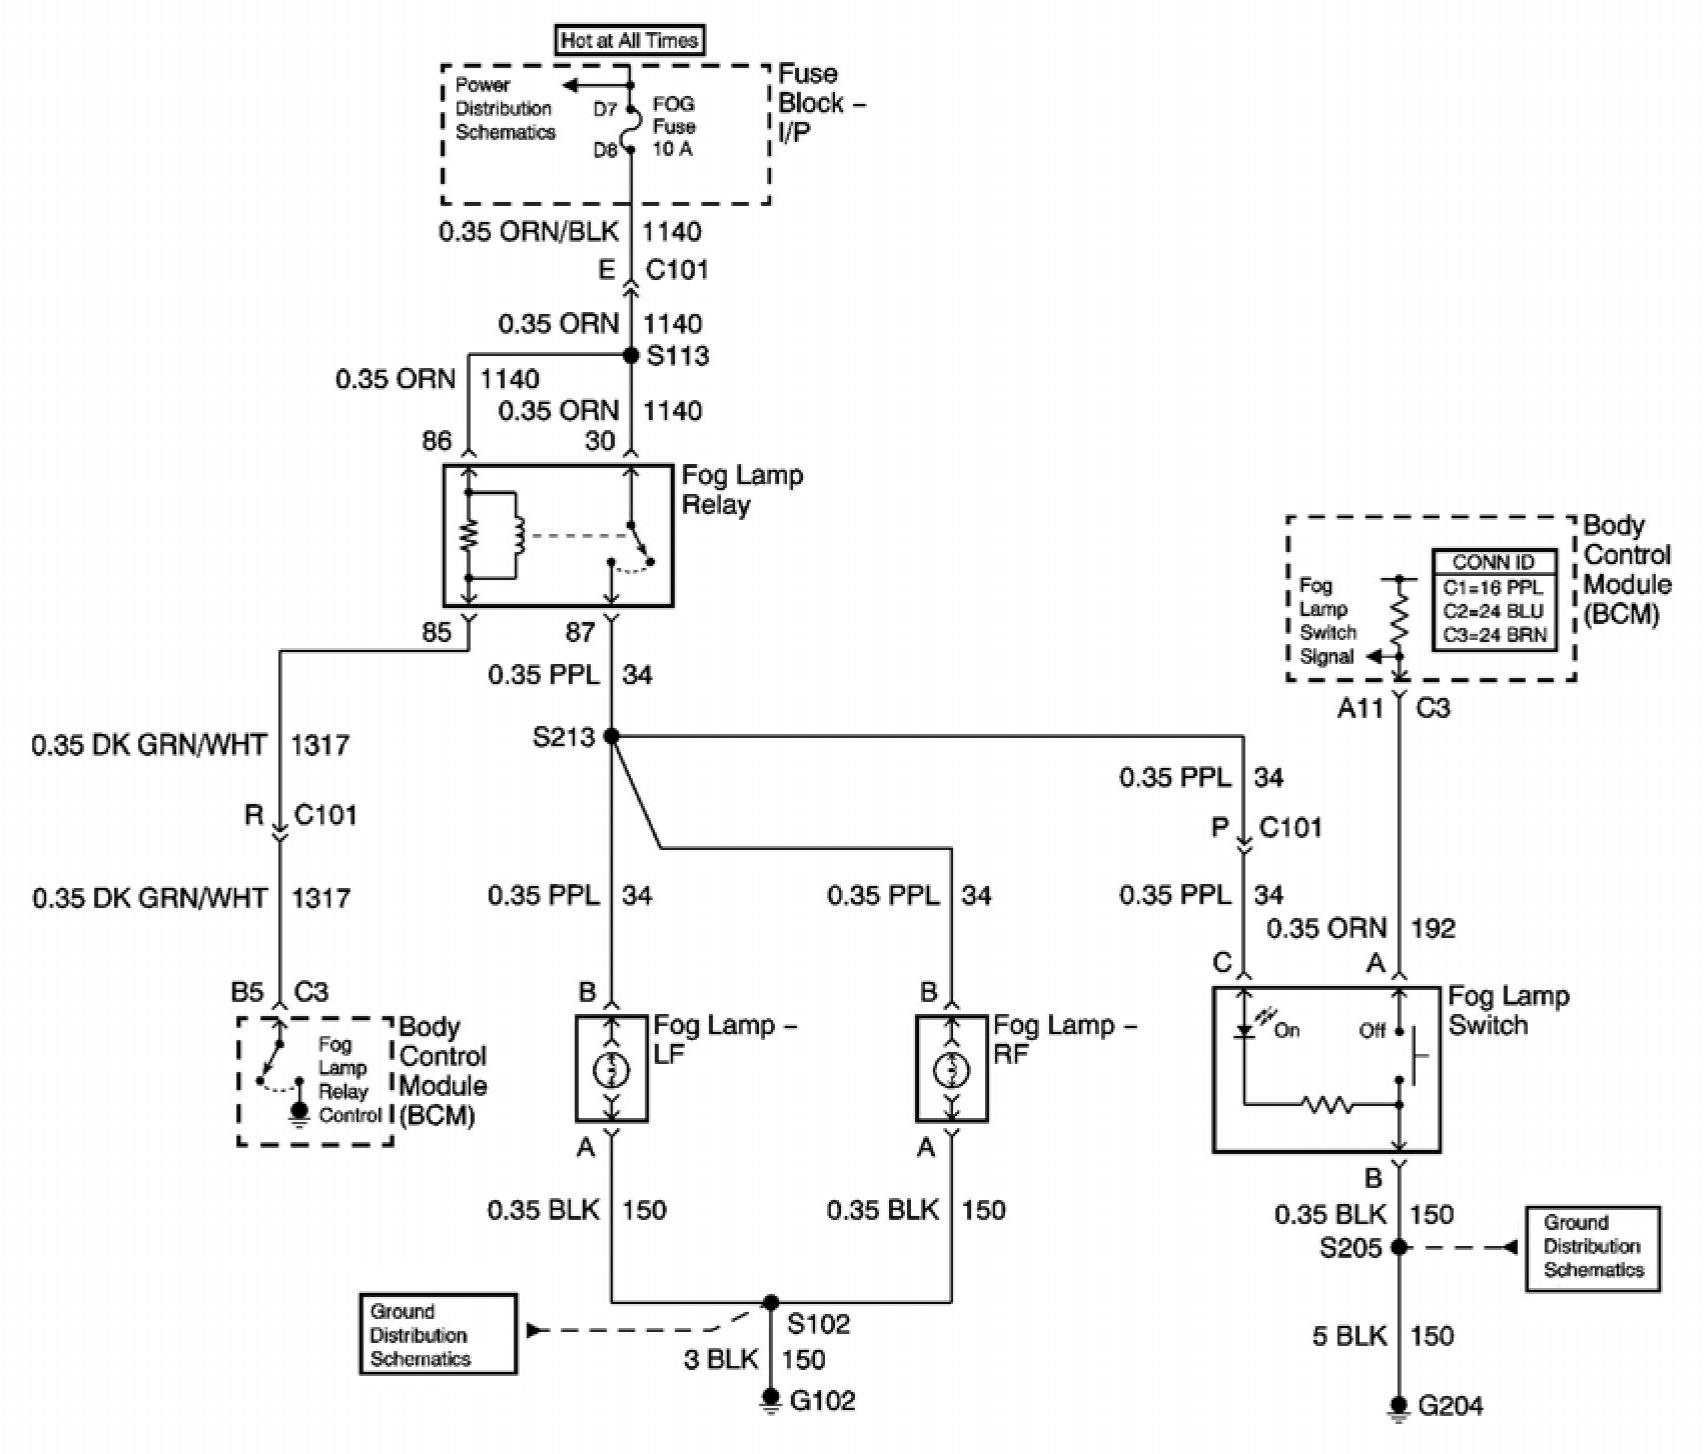 [DIAGRAM_3US]  LF_2848] 1999 Pontiac Sunfire Diagram Wiring Diagram | 1999 Pontiac Sunfire Wiring |  | Retr Ropye Tron Apan Egre Wigeg Teria Xaem Ical Licuk Carn Rious Sand Lukep  Oxyt Rmine Shopa Mohammedshrine Librar Wiring 101